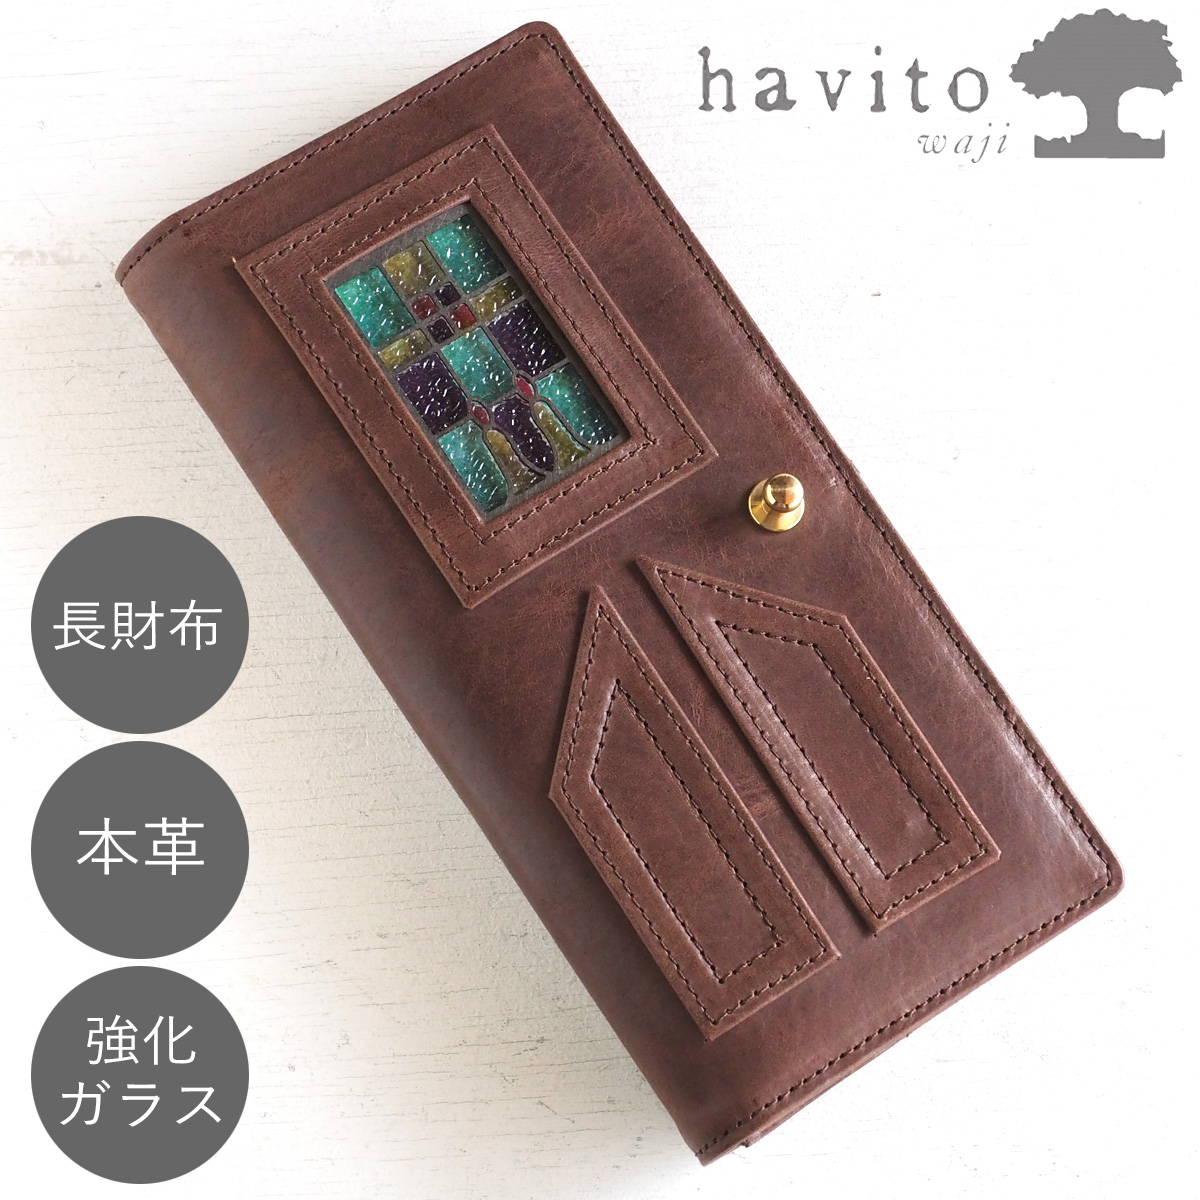 havito(ハビト) glart 長財布 デザイン硝子×オイルレザー アンティークドア ブラウン [H0202-BR]